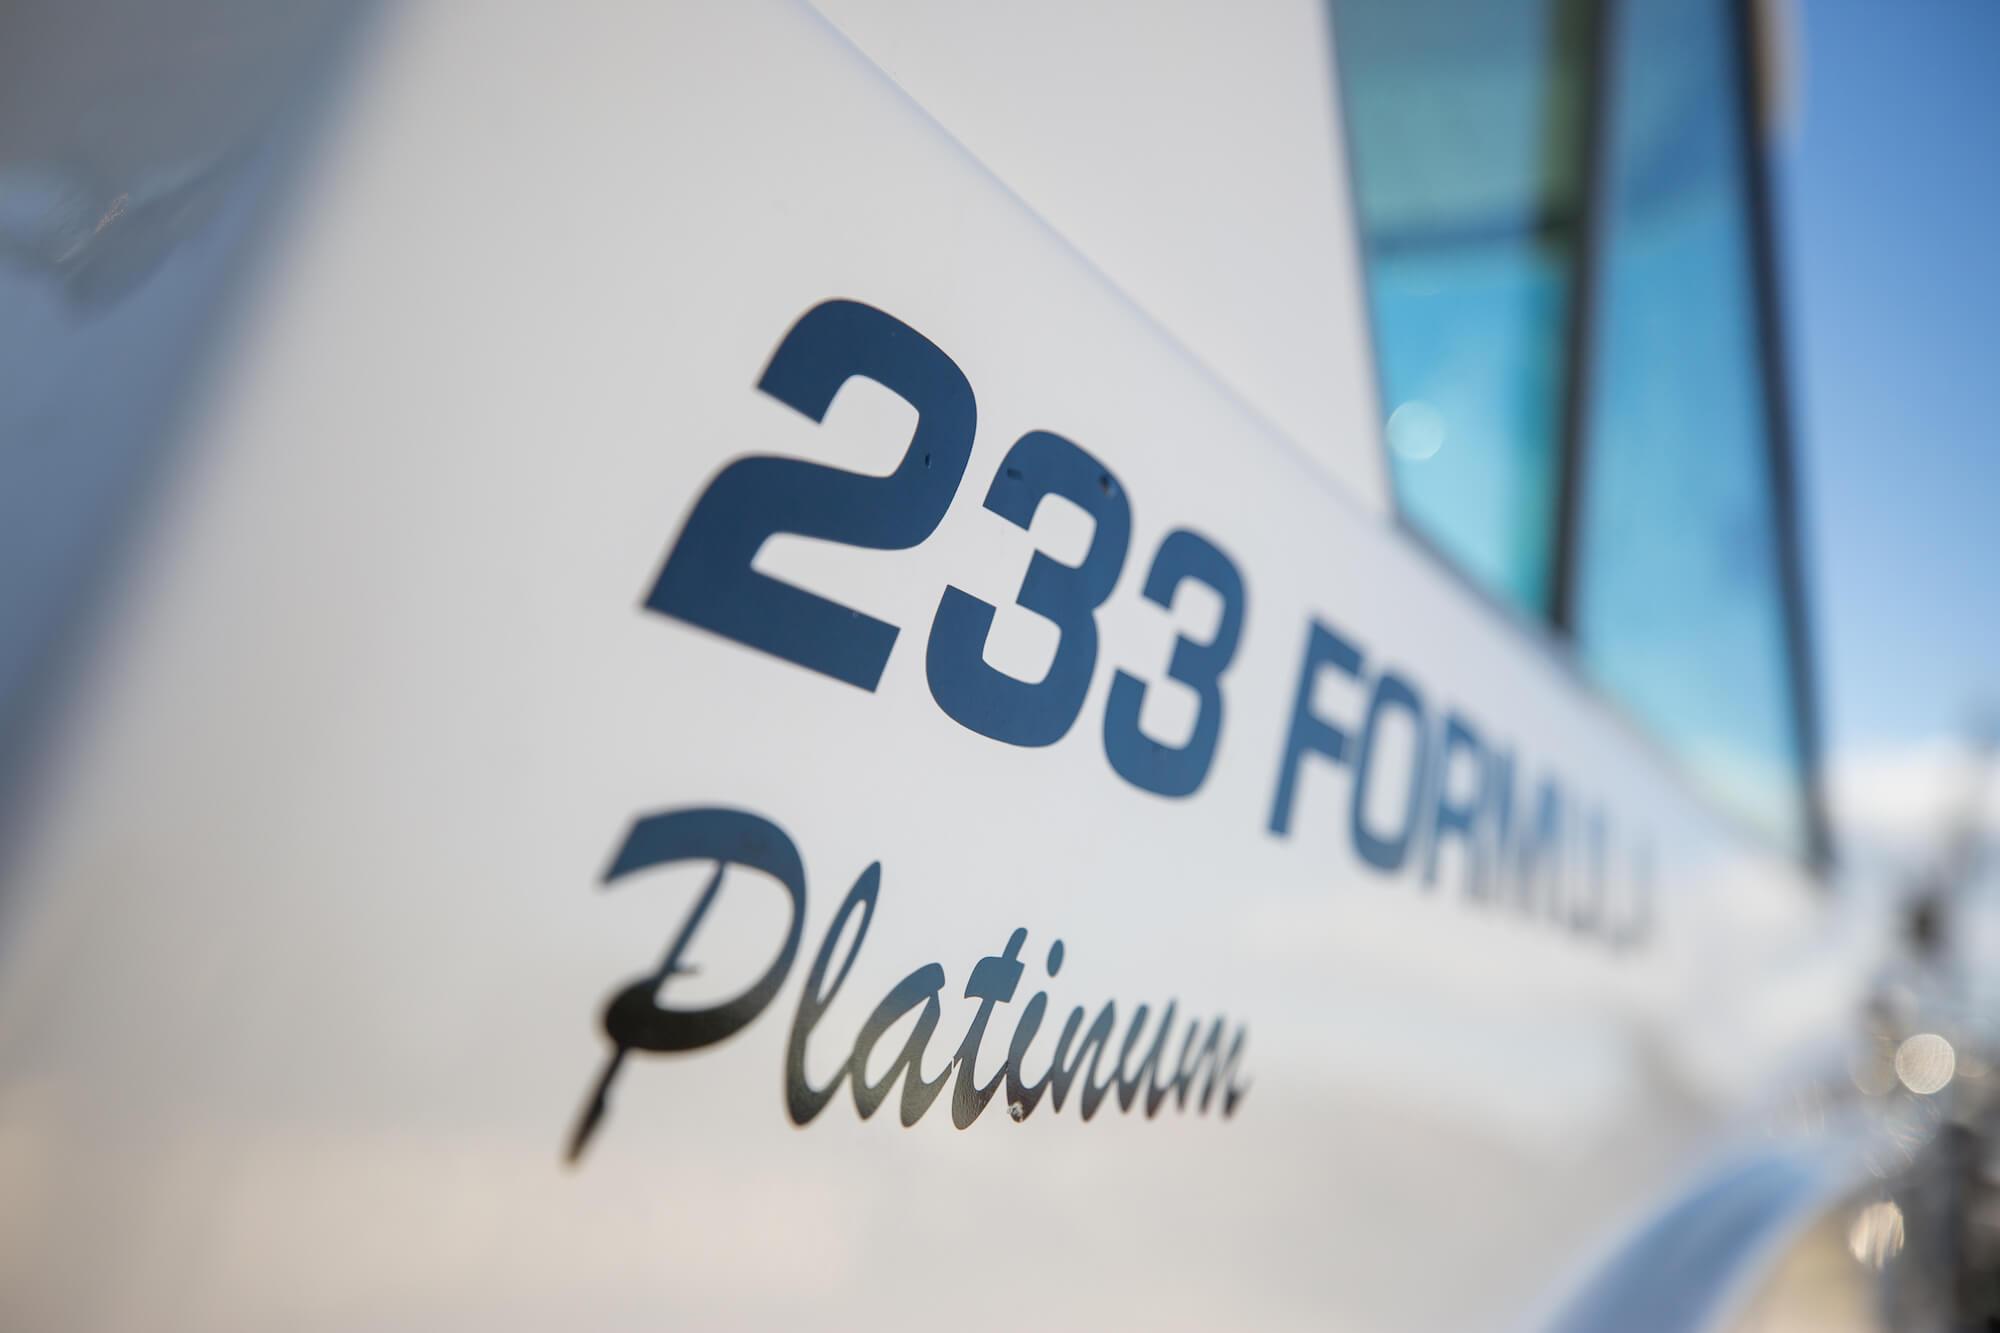 233 Formula Platinum sticker on an Edencraft 233 Formula Platinum boat